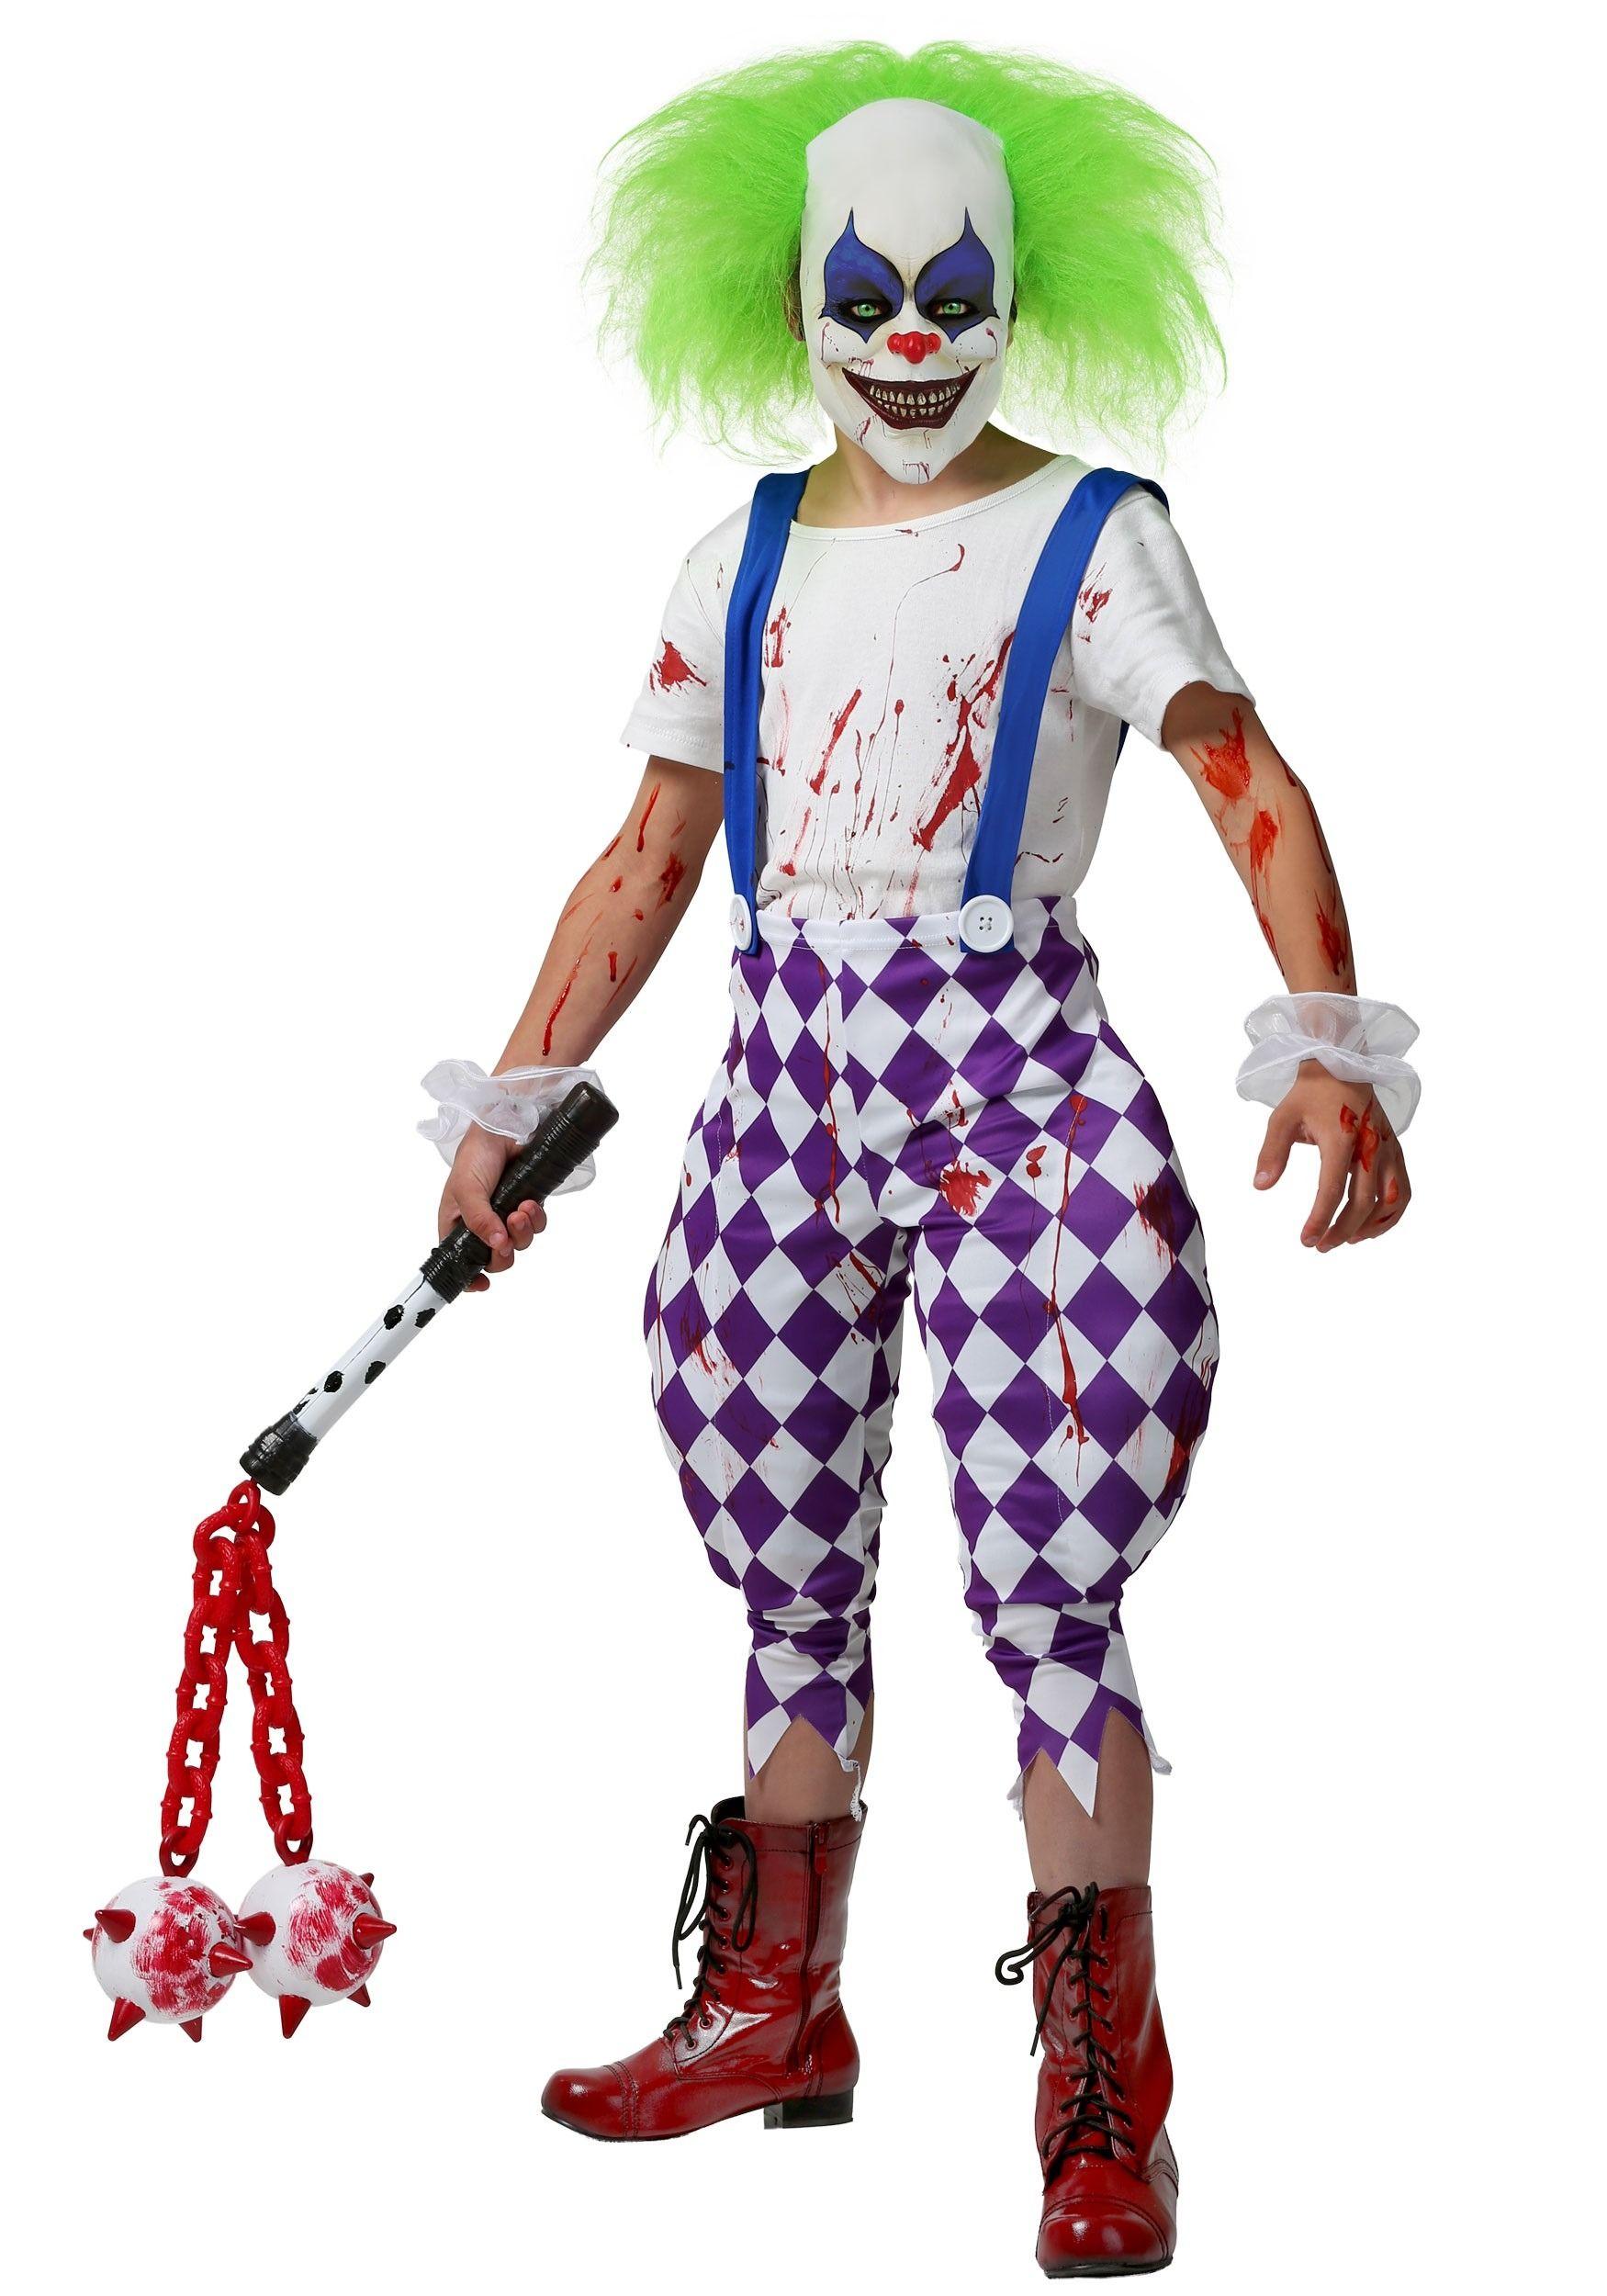 Nightmare Clown Costume For Kids Clown Costume Scary Halloween Costume Clown Halloween Costumes